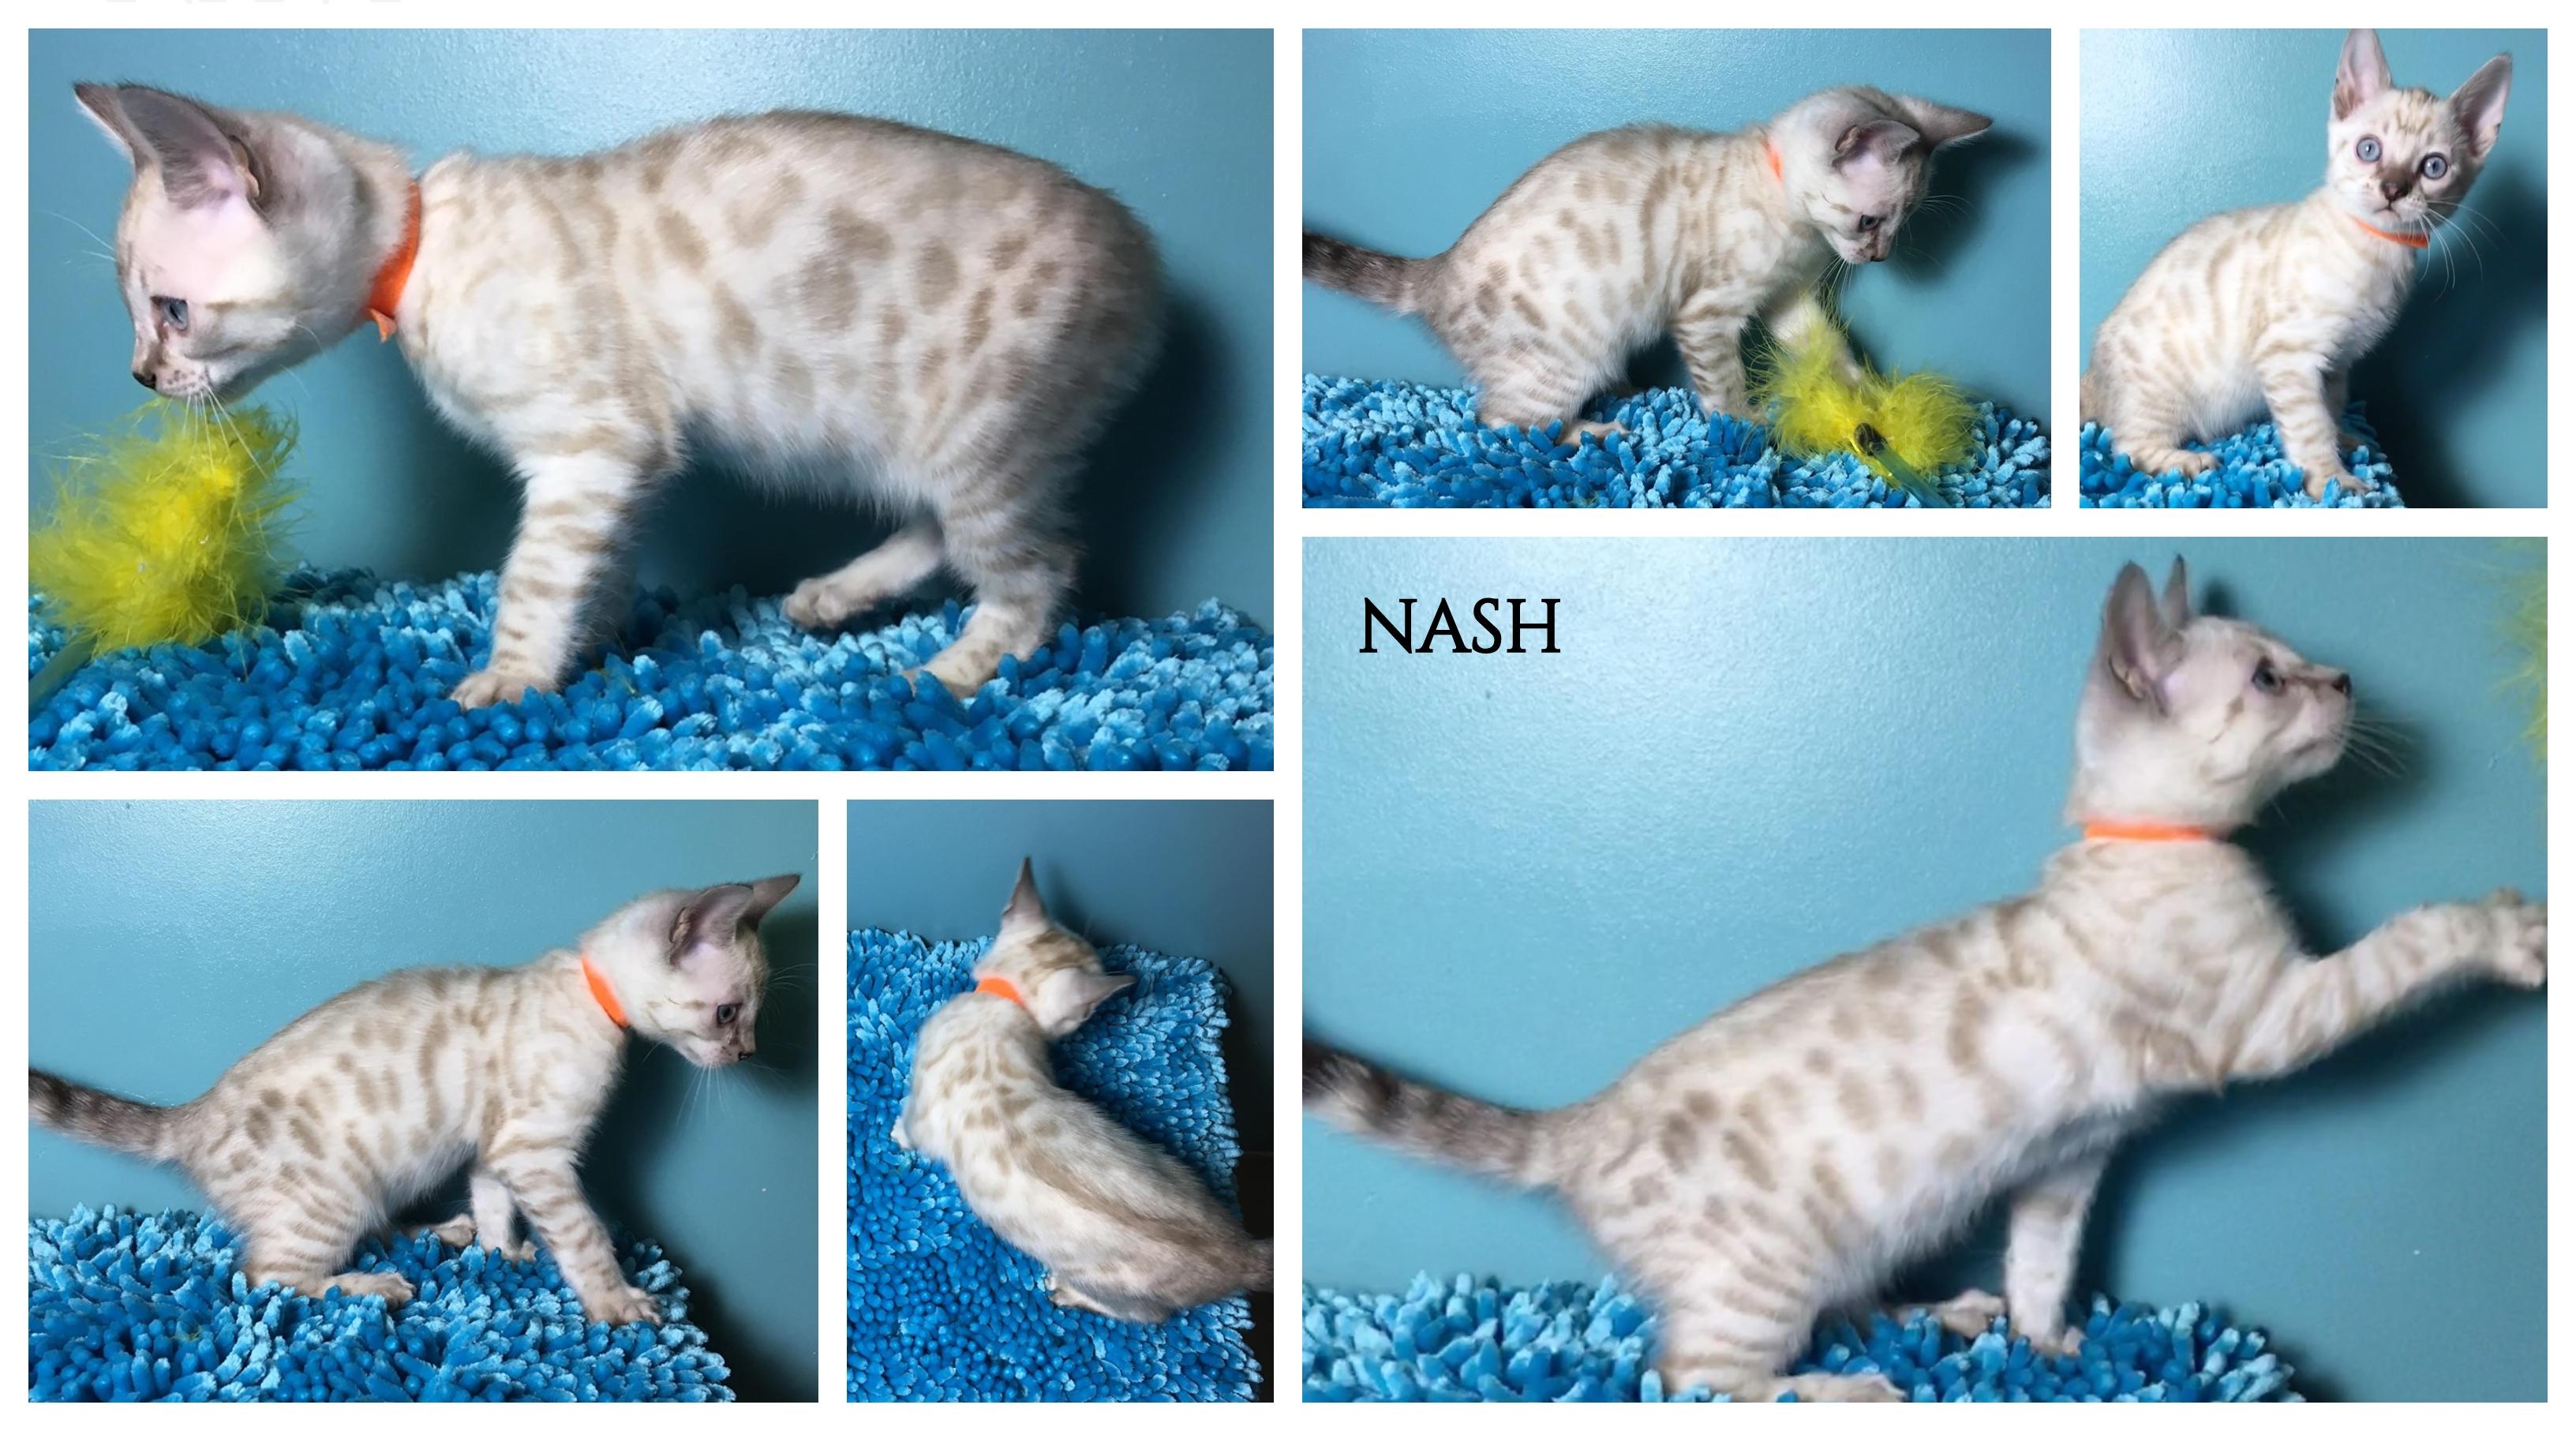 Nash 9 weeks